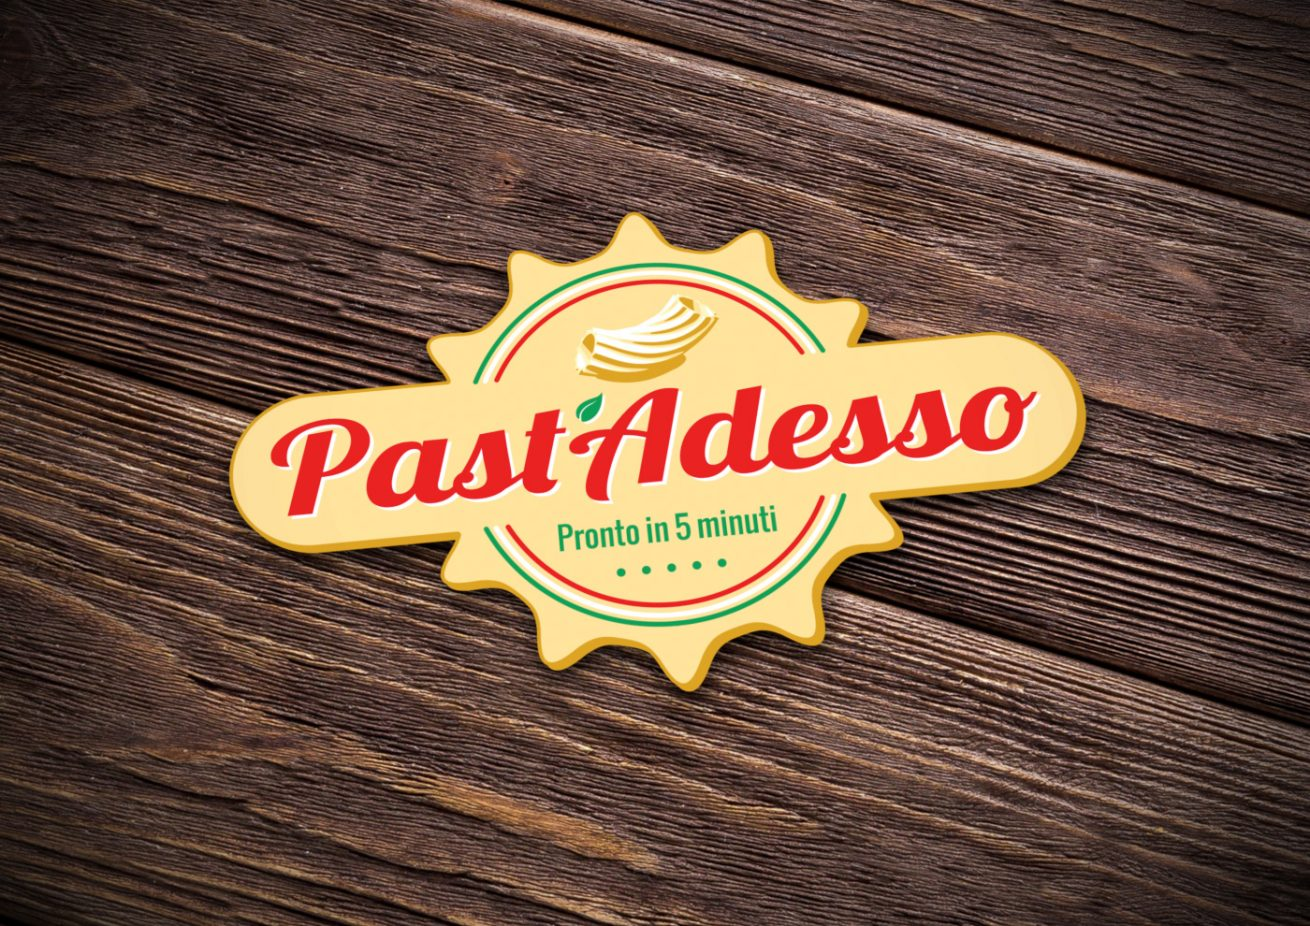 PastAdesso Badge